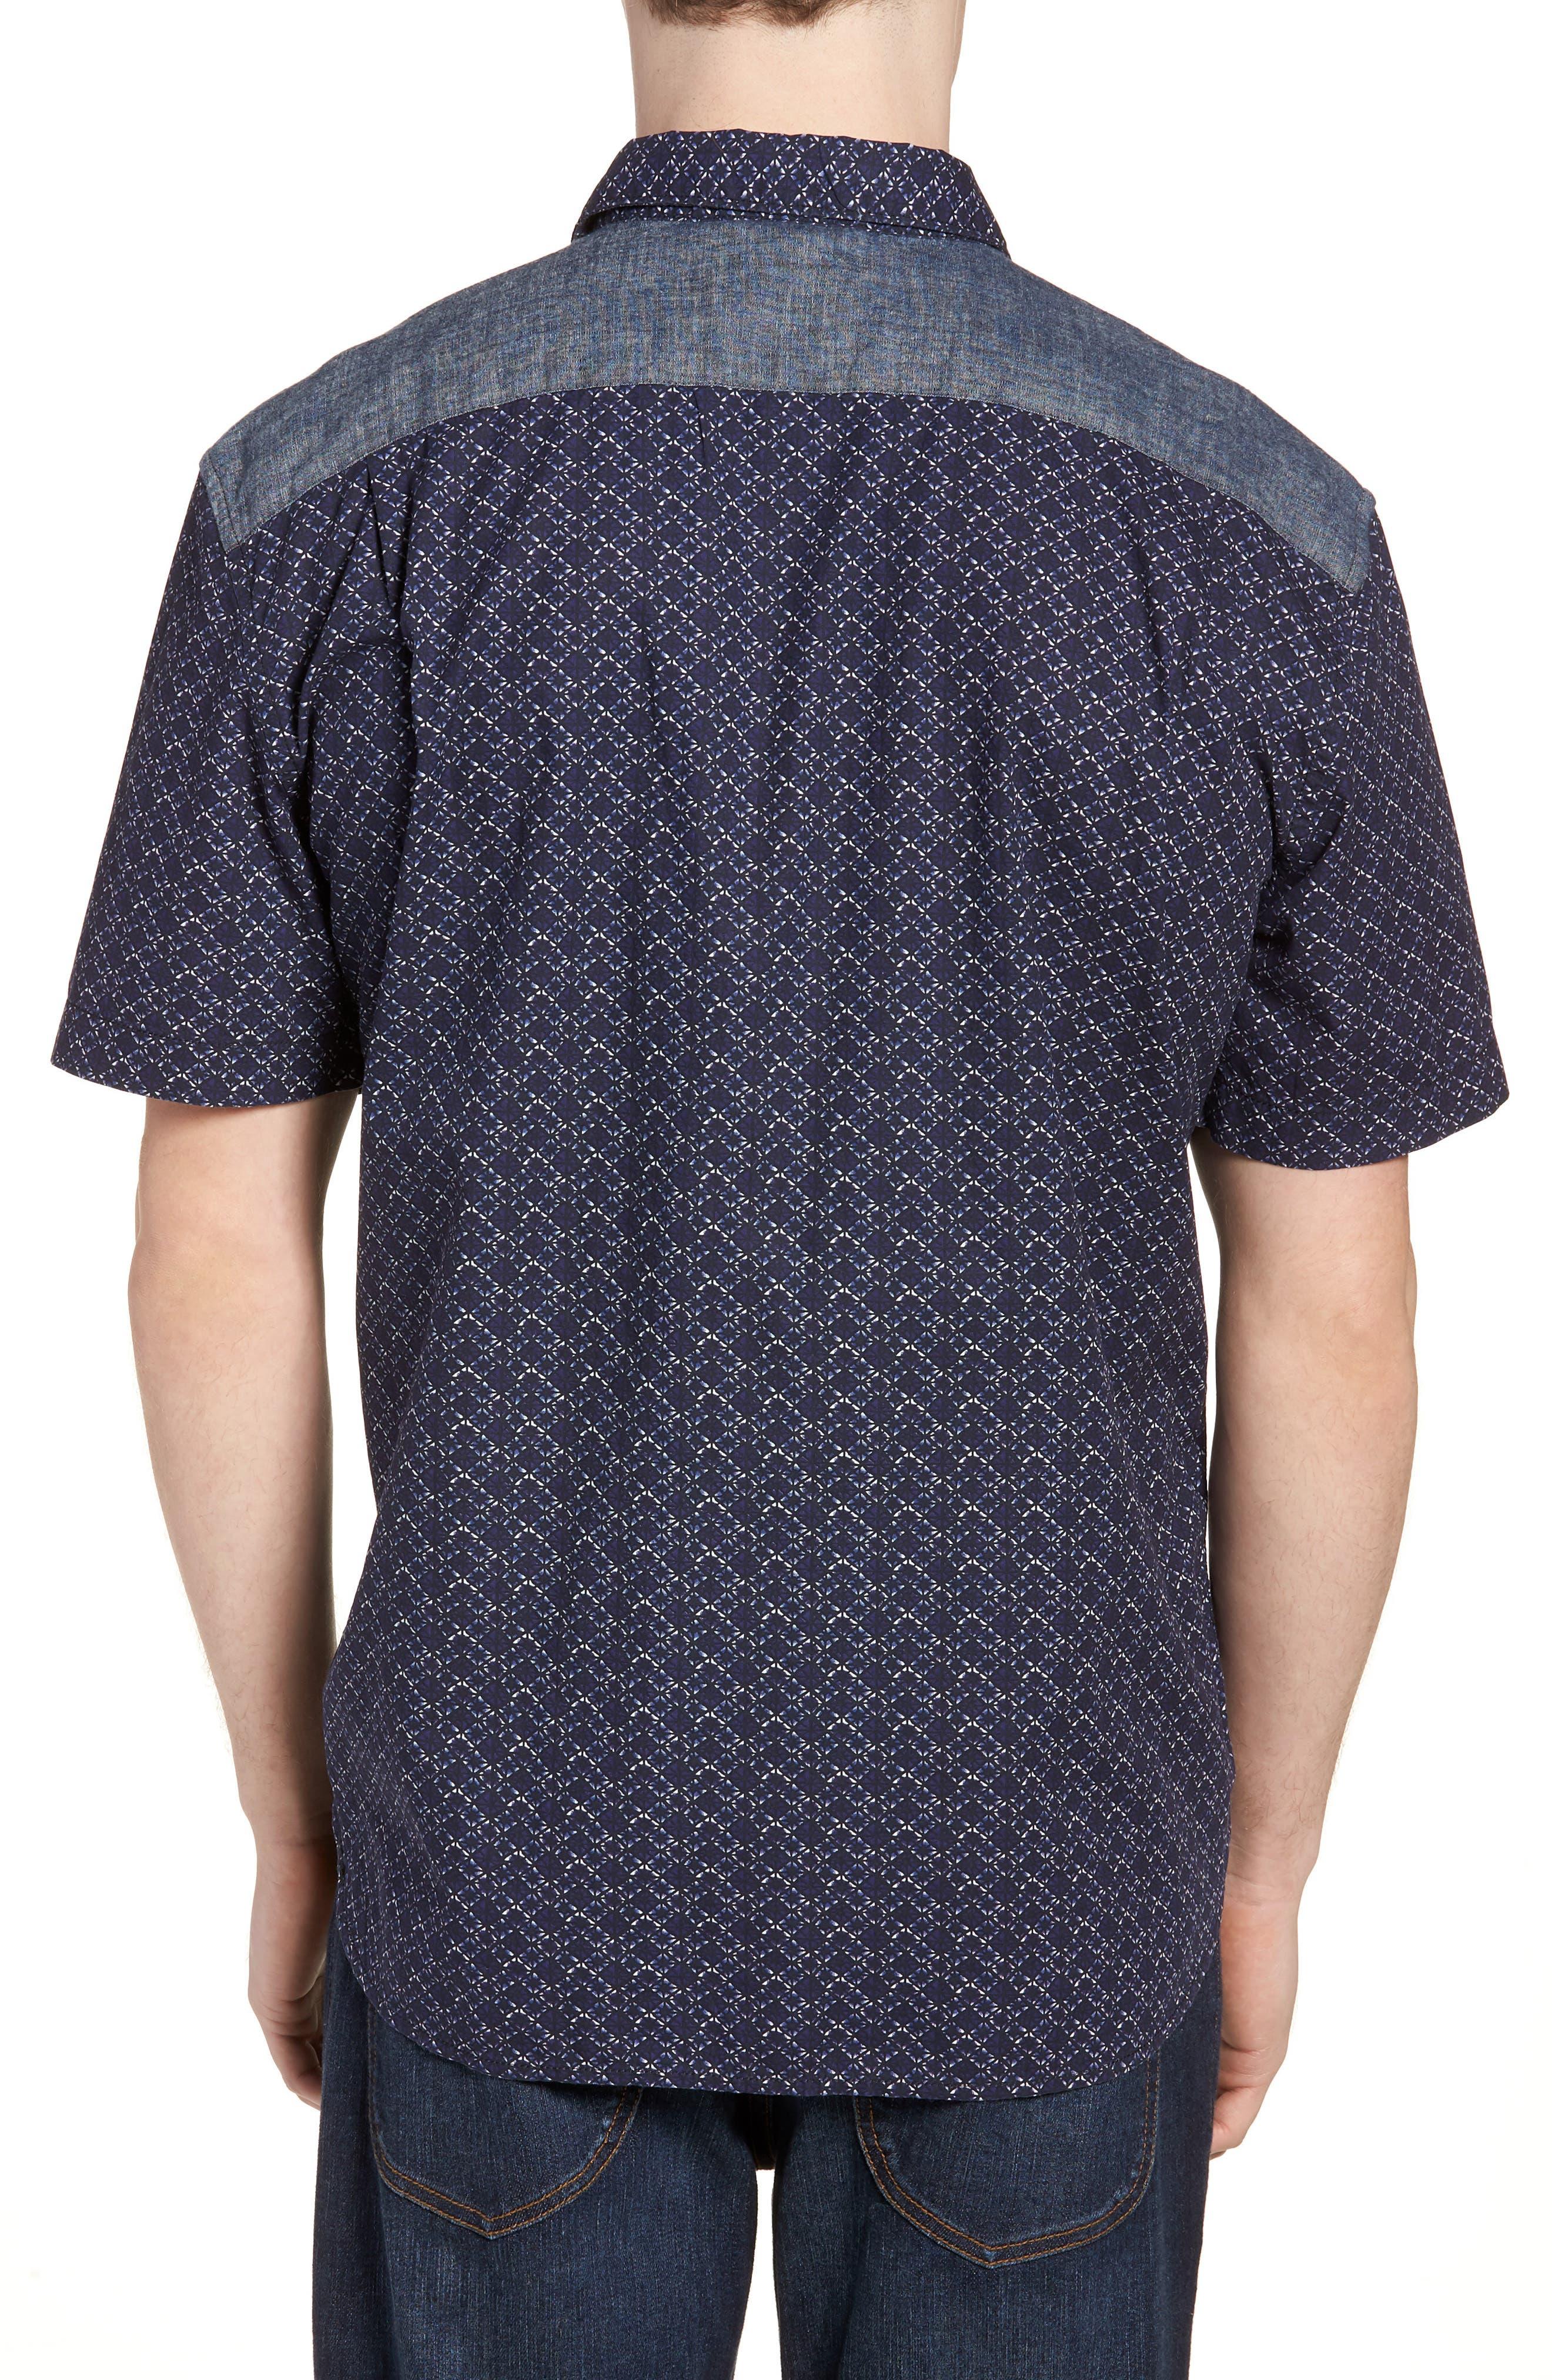 Kast Relaxed Fit Short Sleeve Sport Shirt,                             Alternate thumbnail 2, color,                             Deep Cobalt